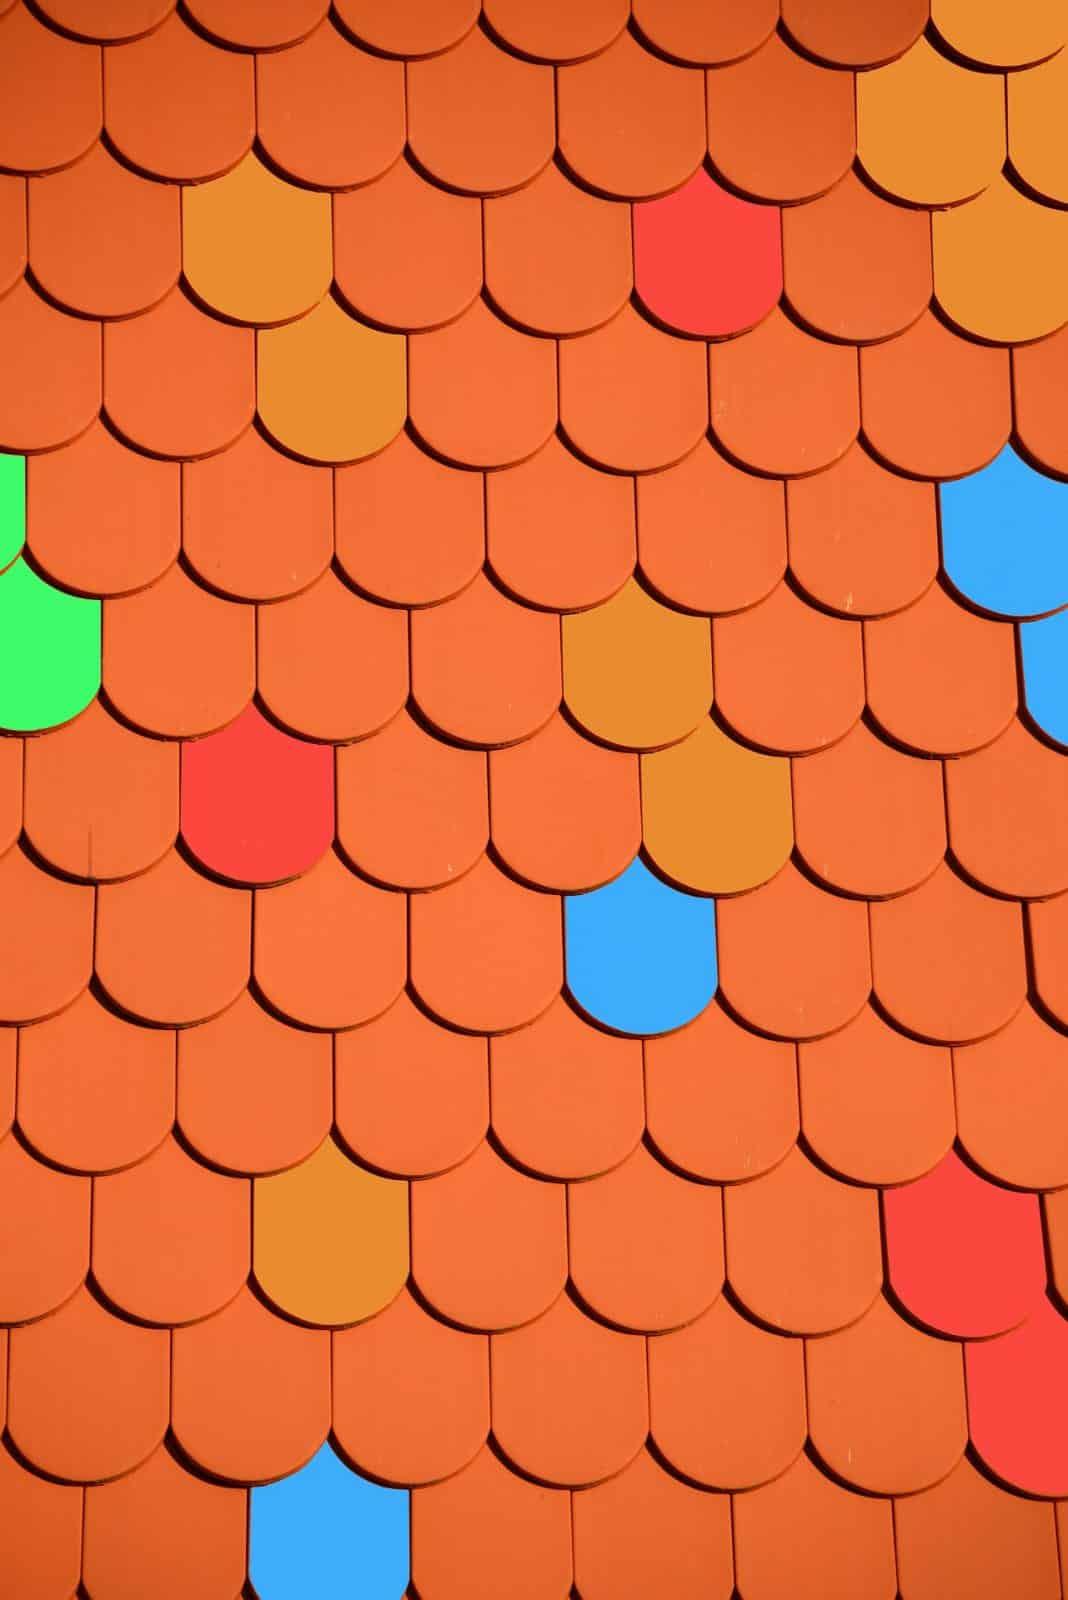 radi pokryjú strechu